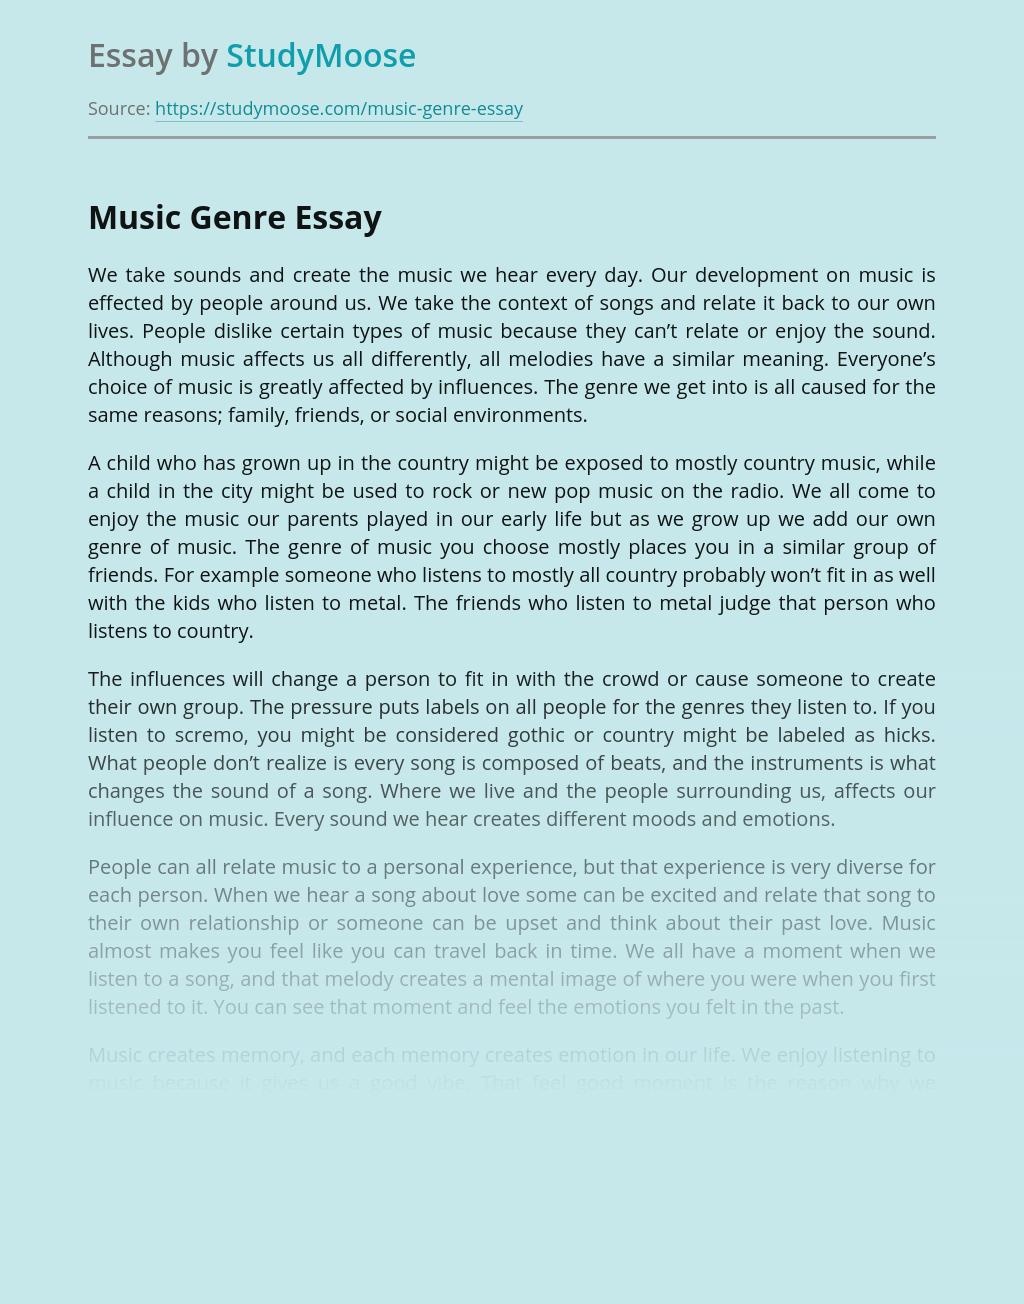 Favorite song essay